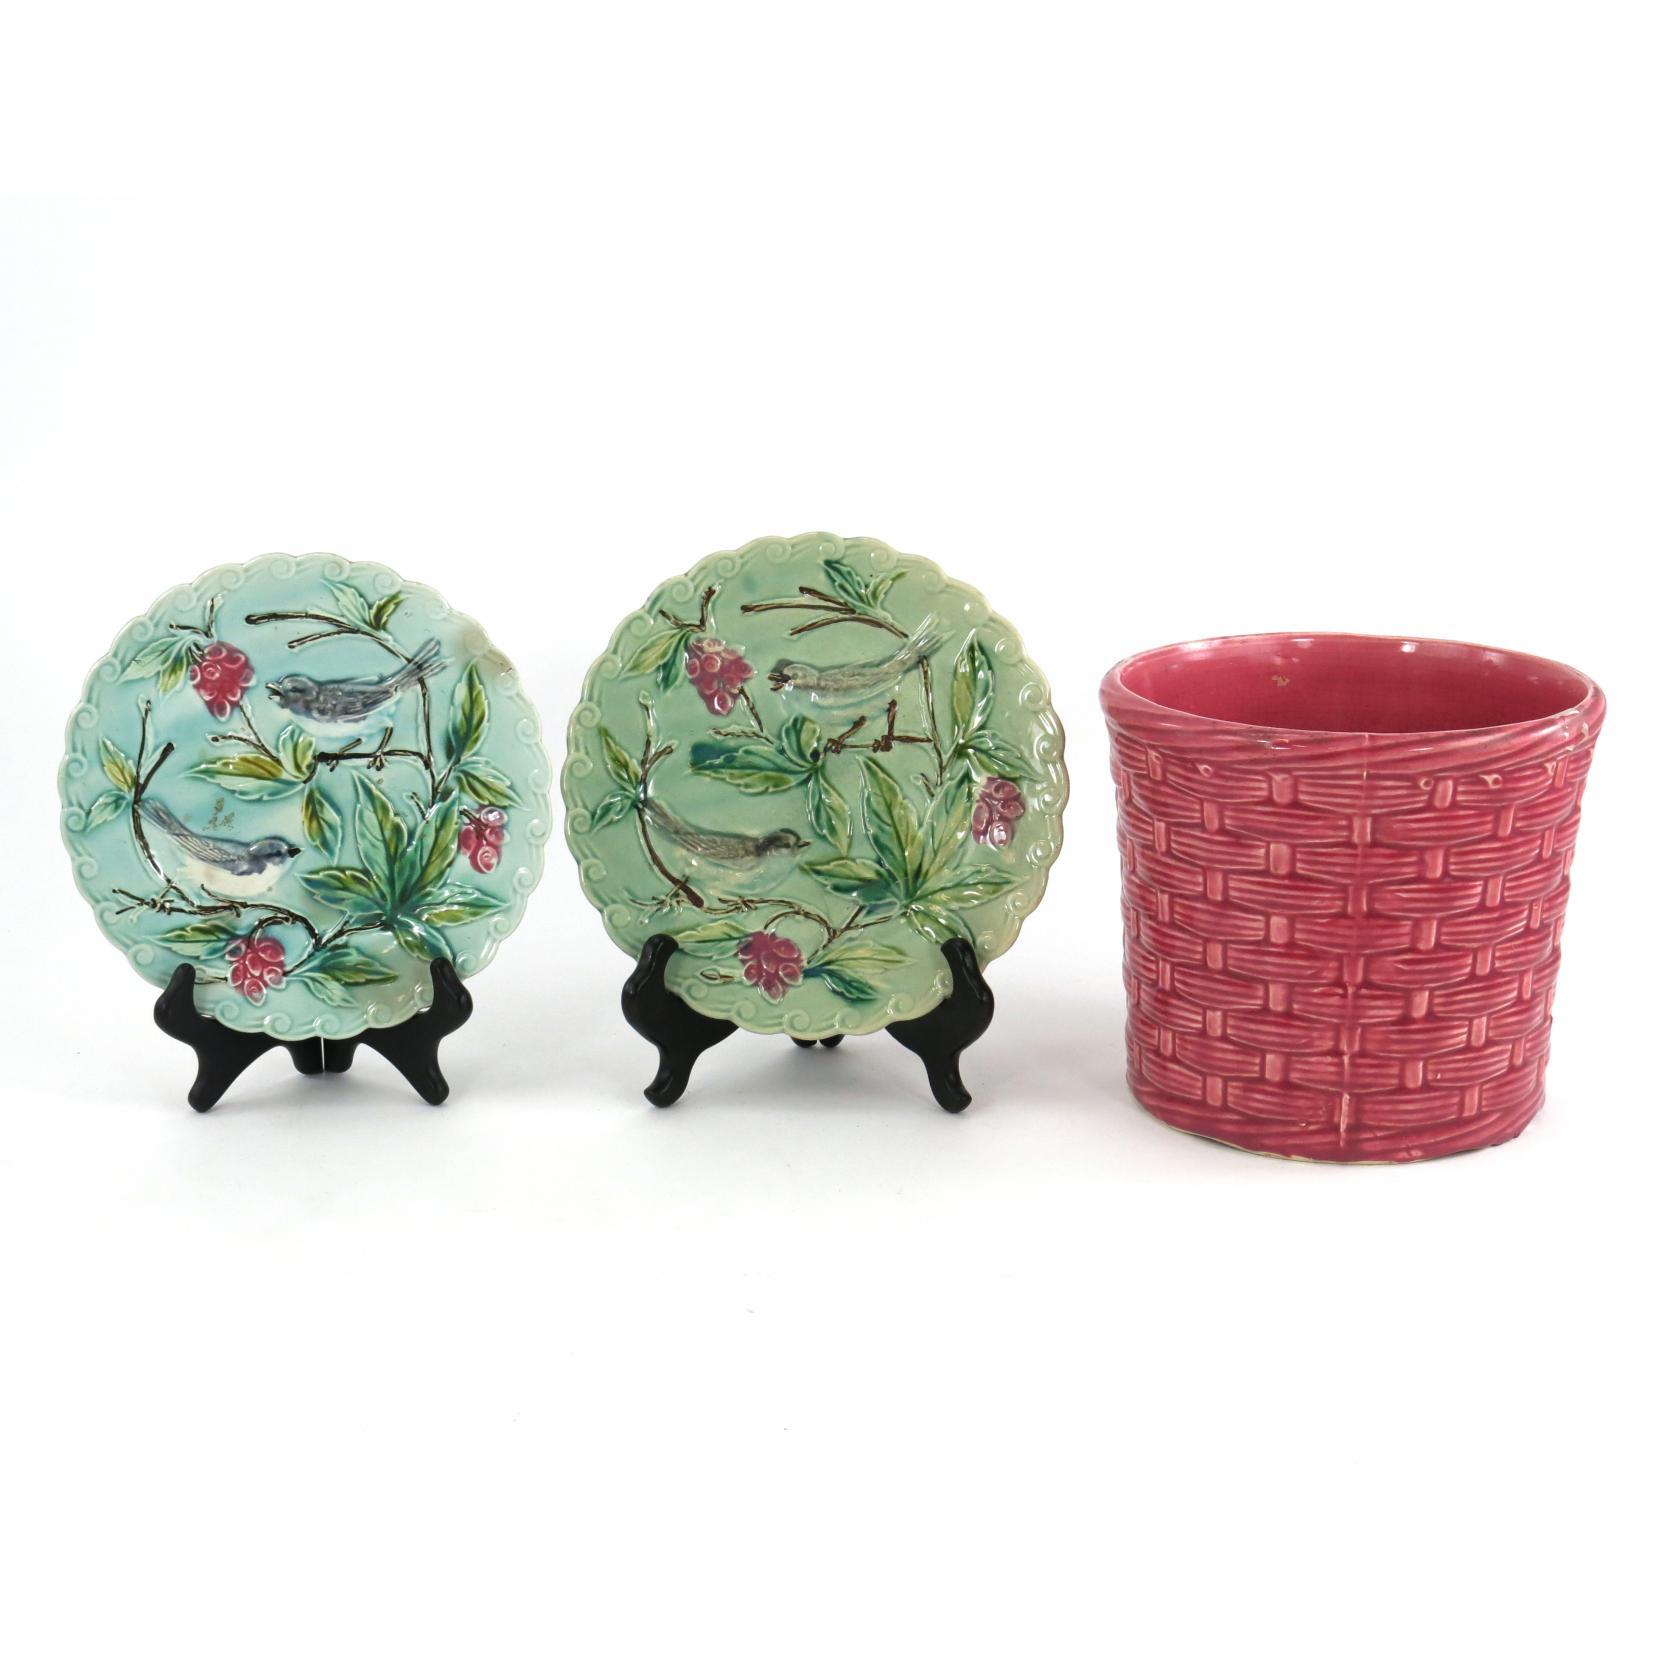 antique-english-pottery-majolica